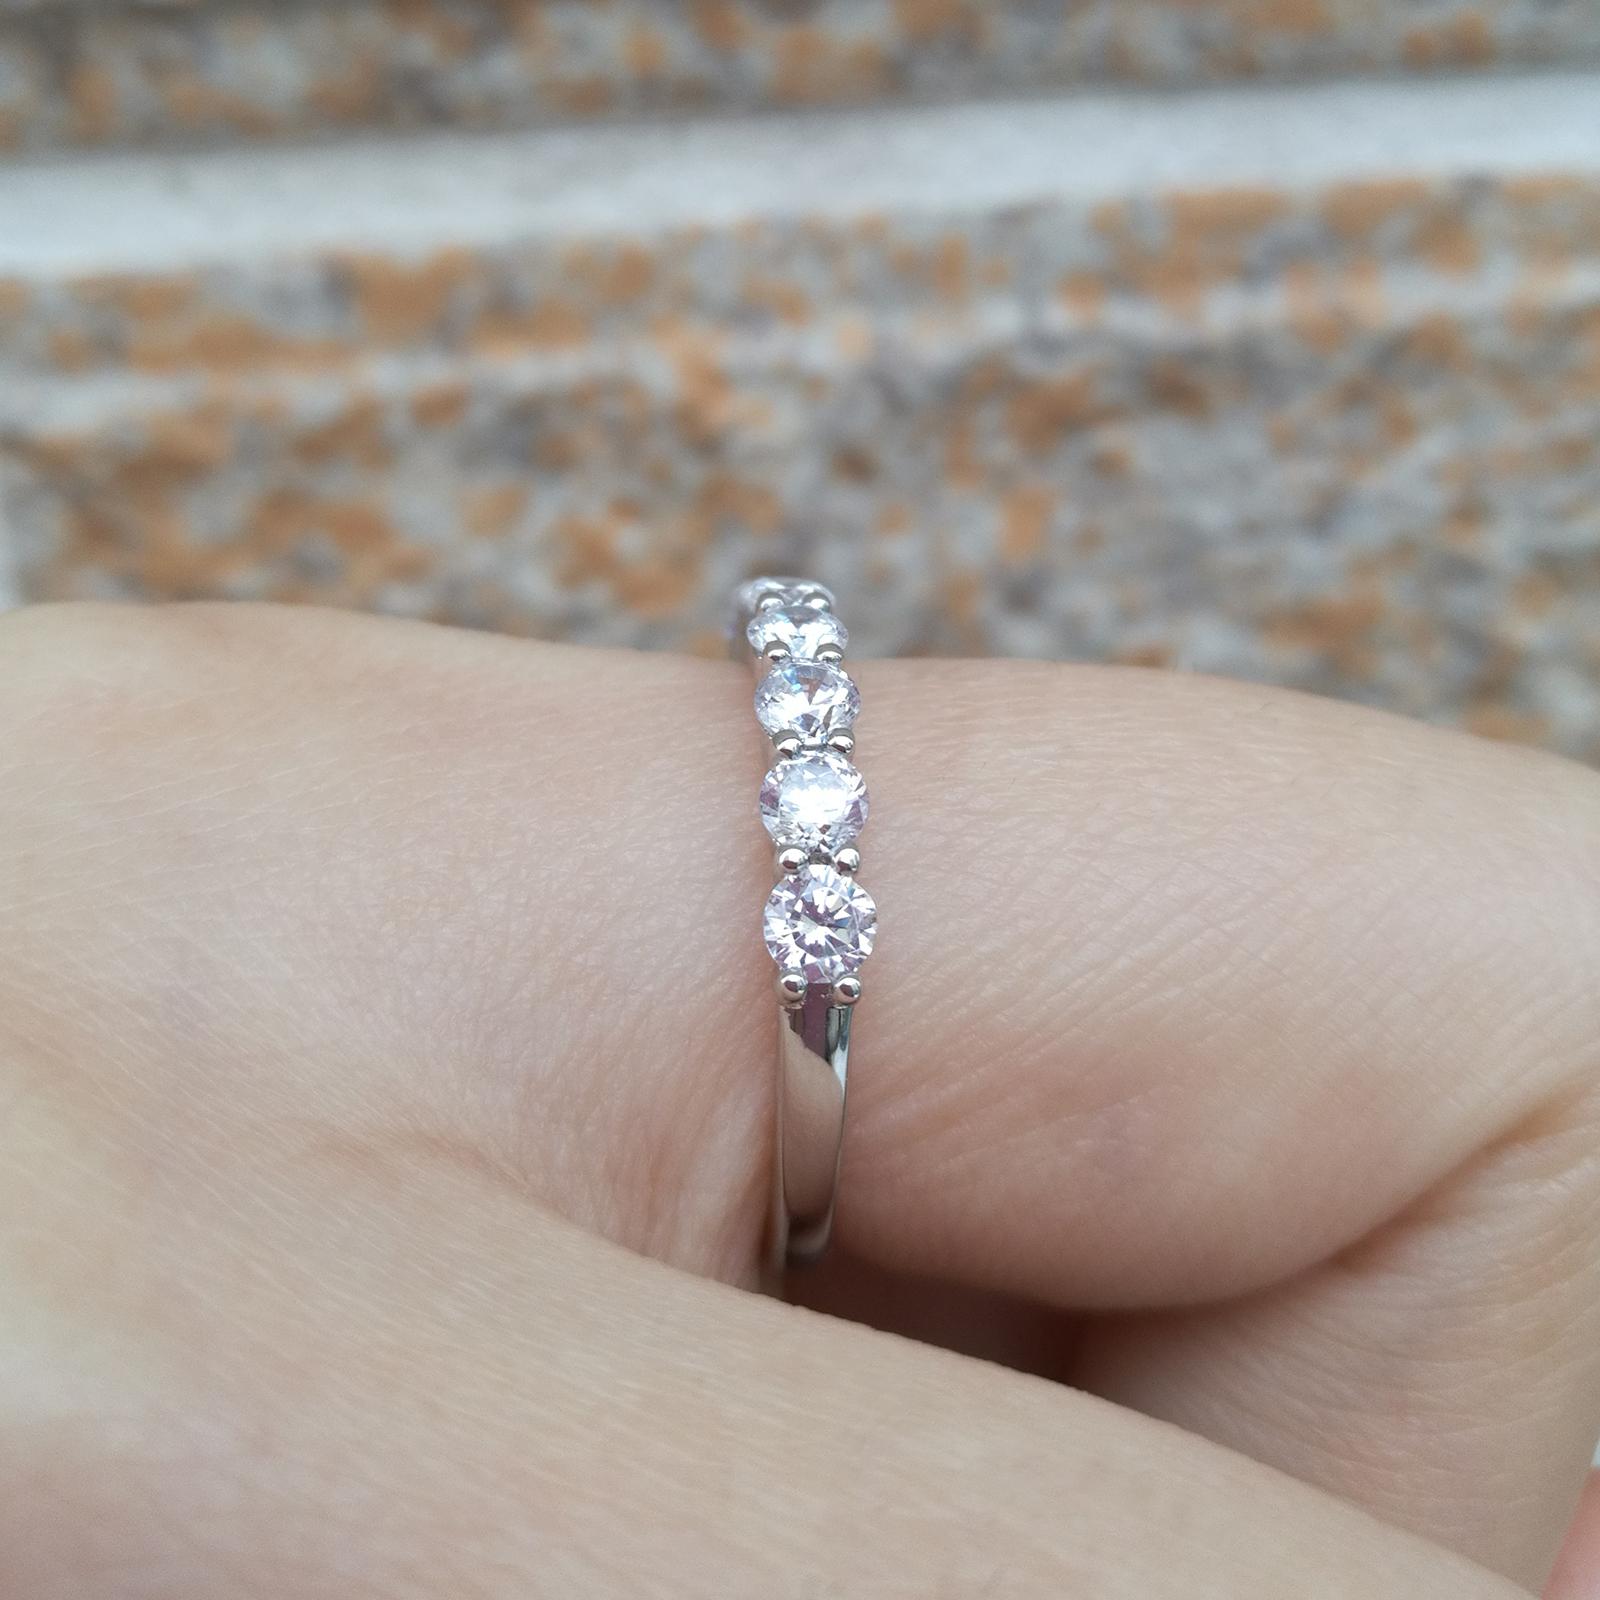 Silver Wedding Engagement Rings  - 1mrk.com